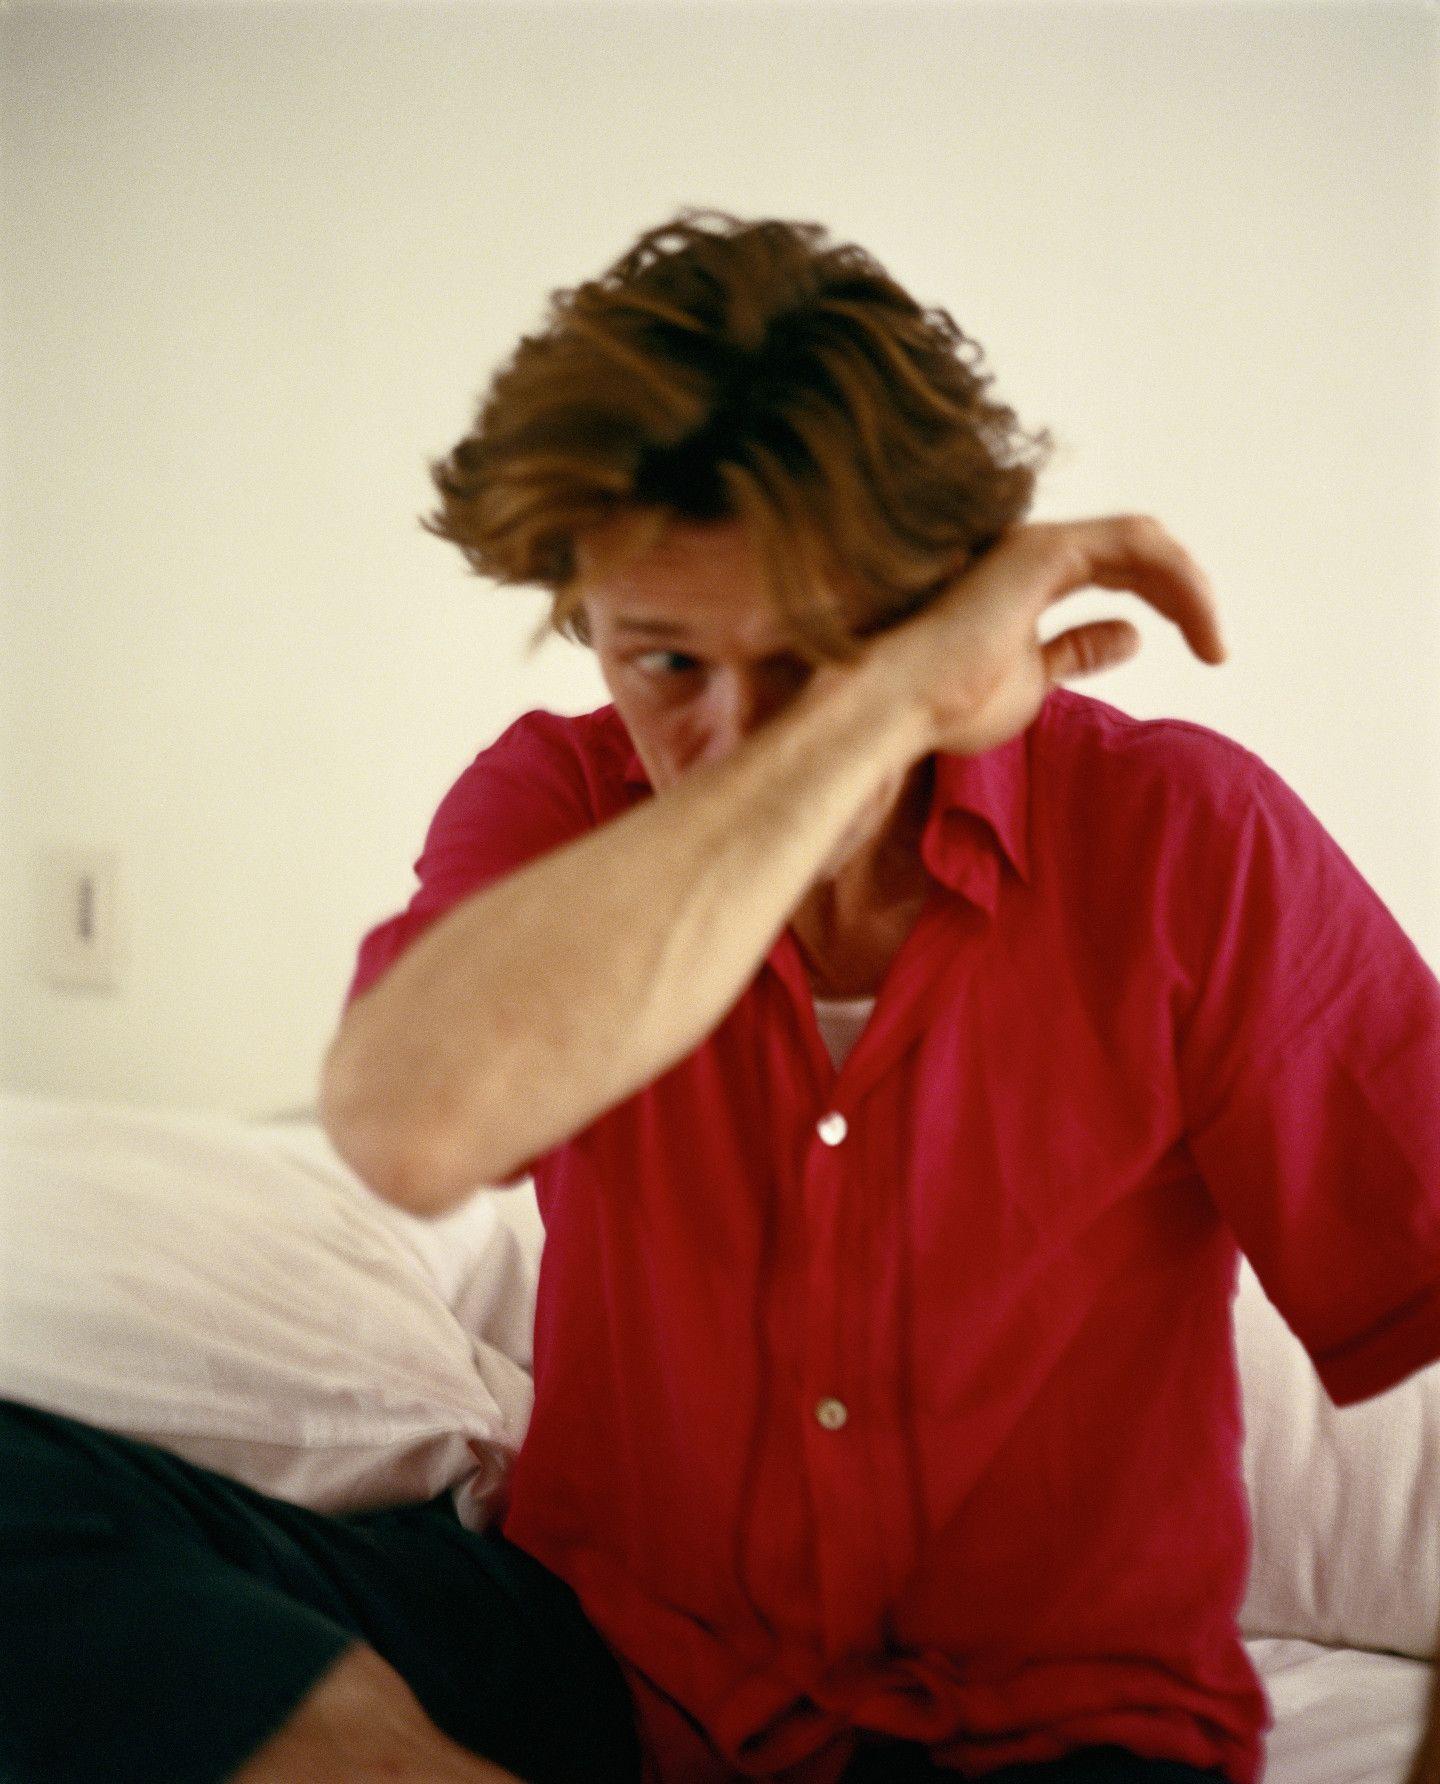 Sam Taylor Johnson Crying Men 2002 2004 Crying Man Sam Taylor Johnson Men Photography